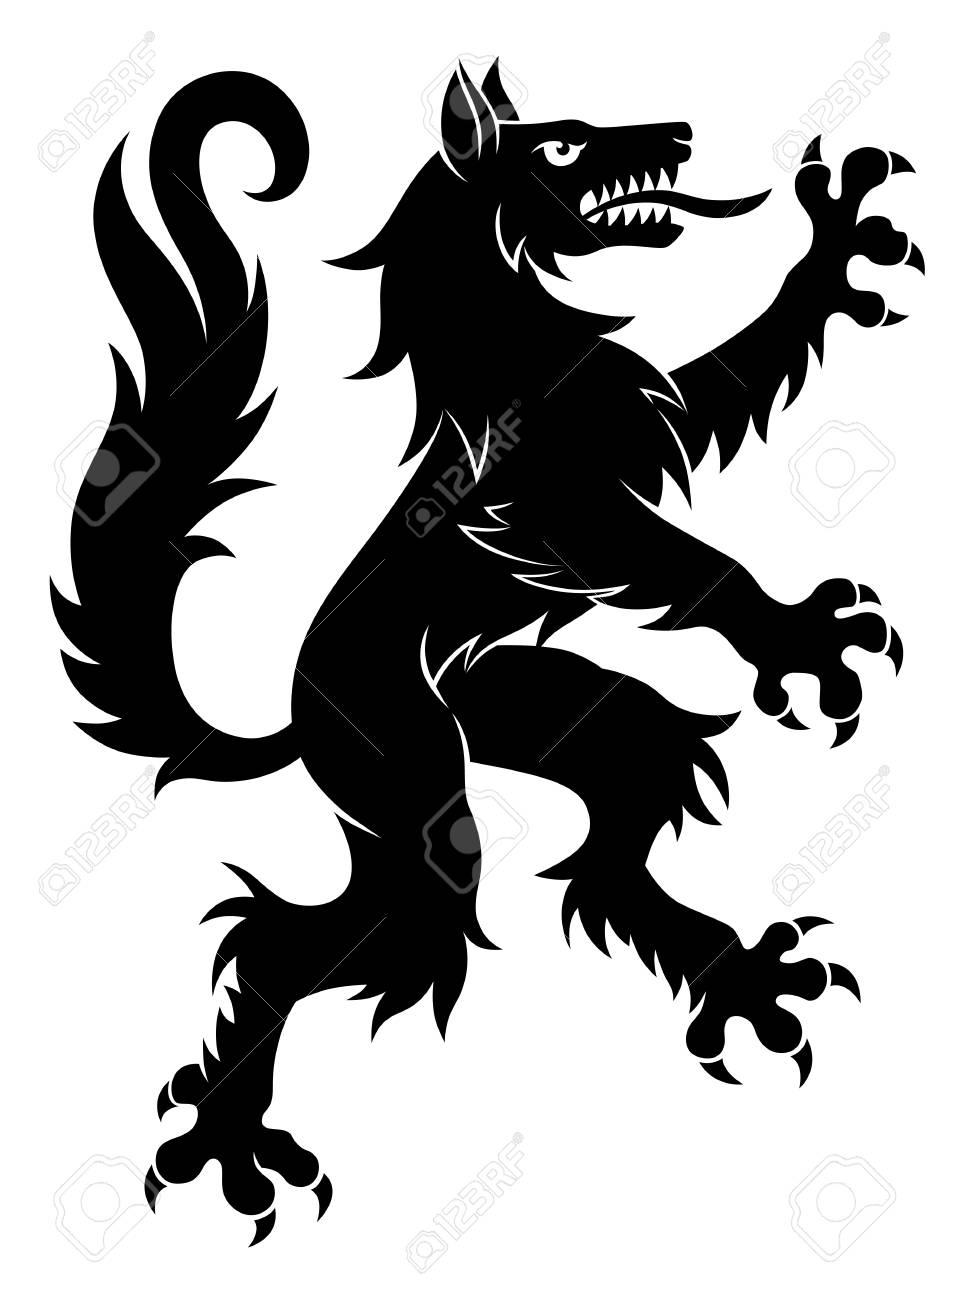 Heraldic wolf simple Vector illustration. - 87698581